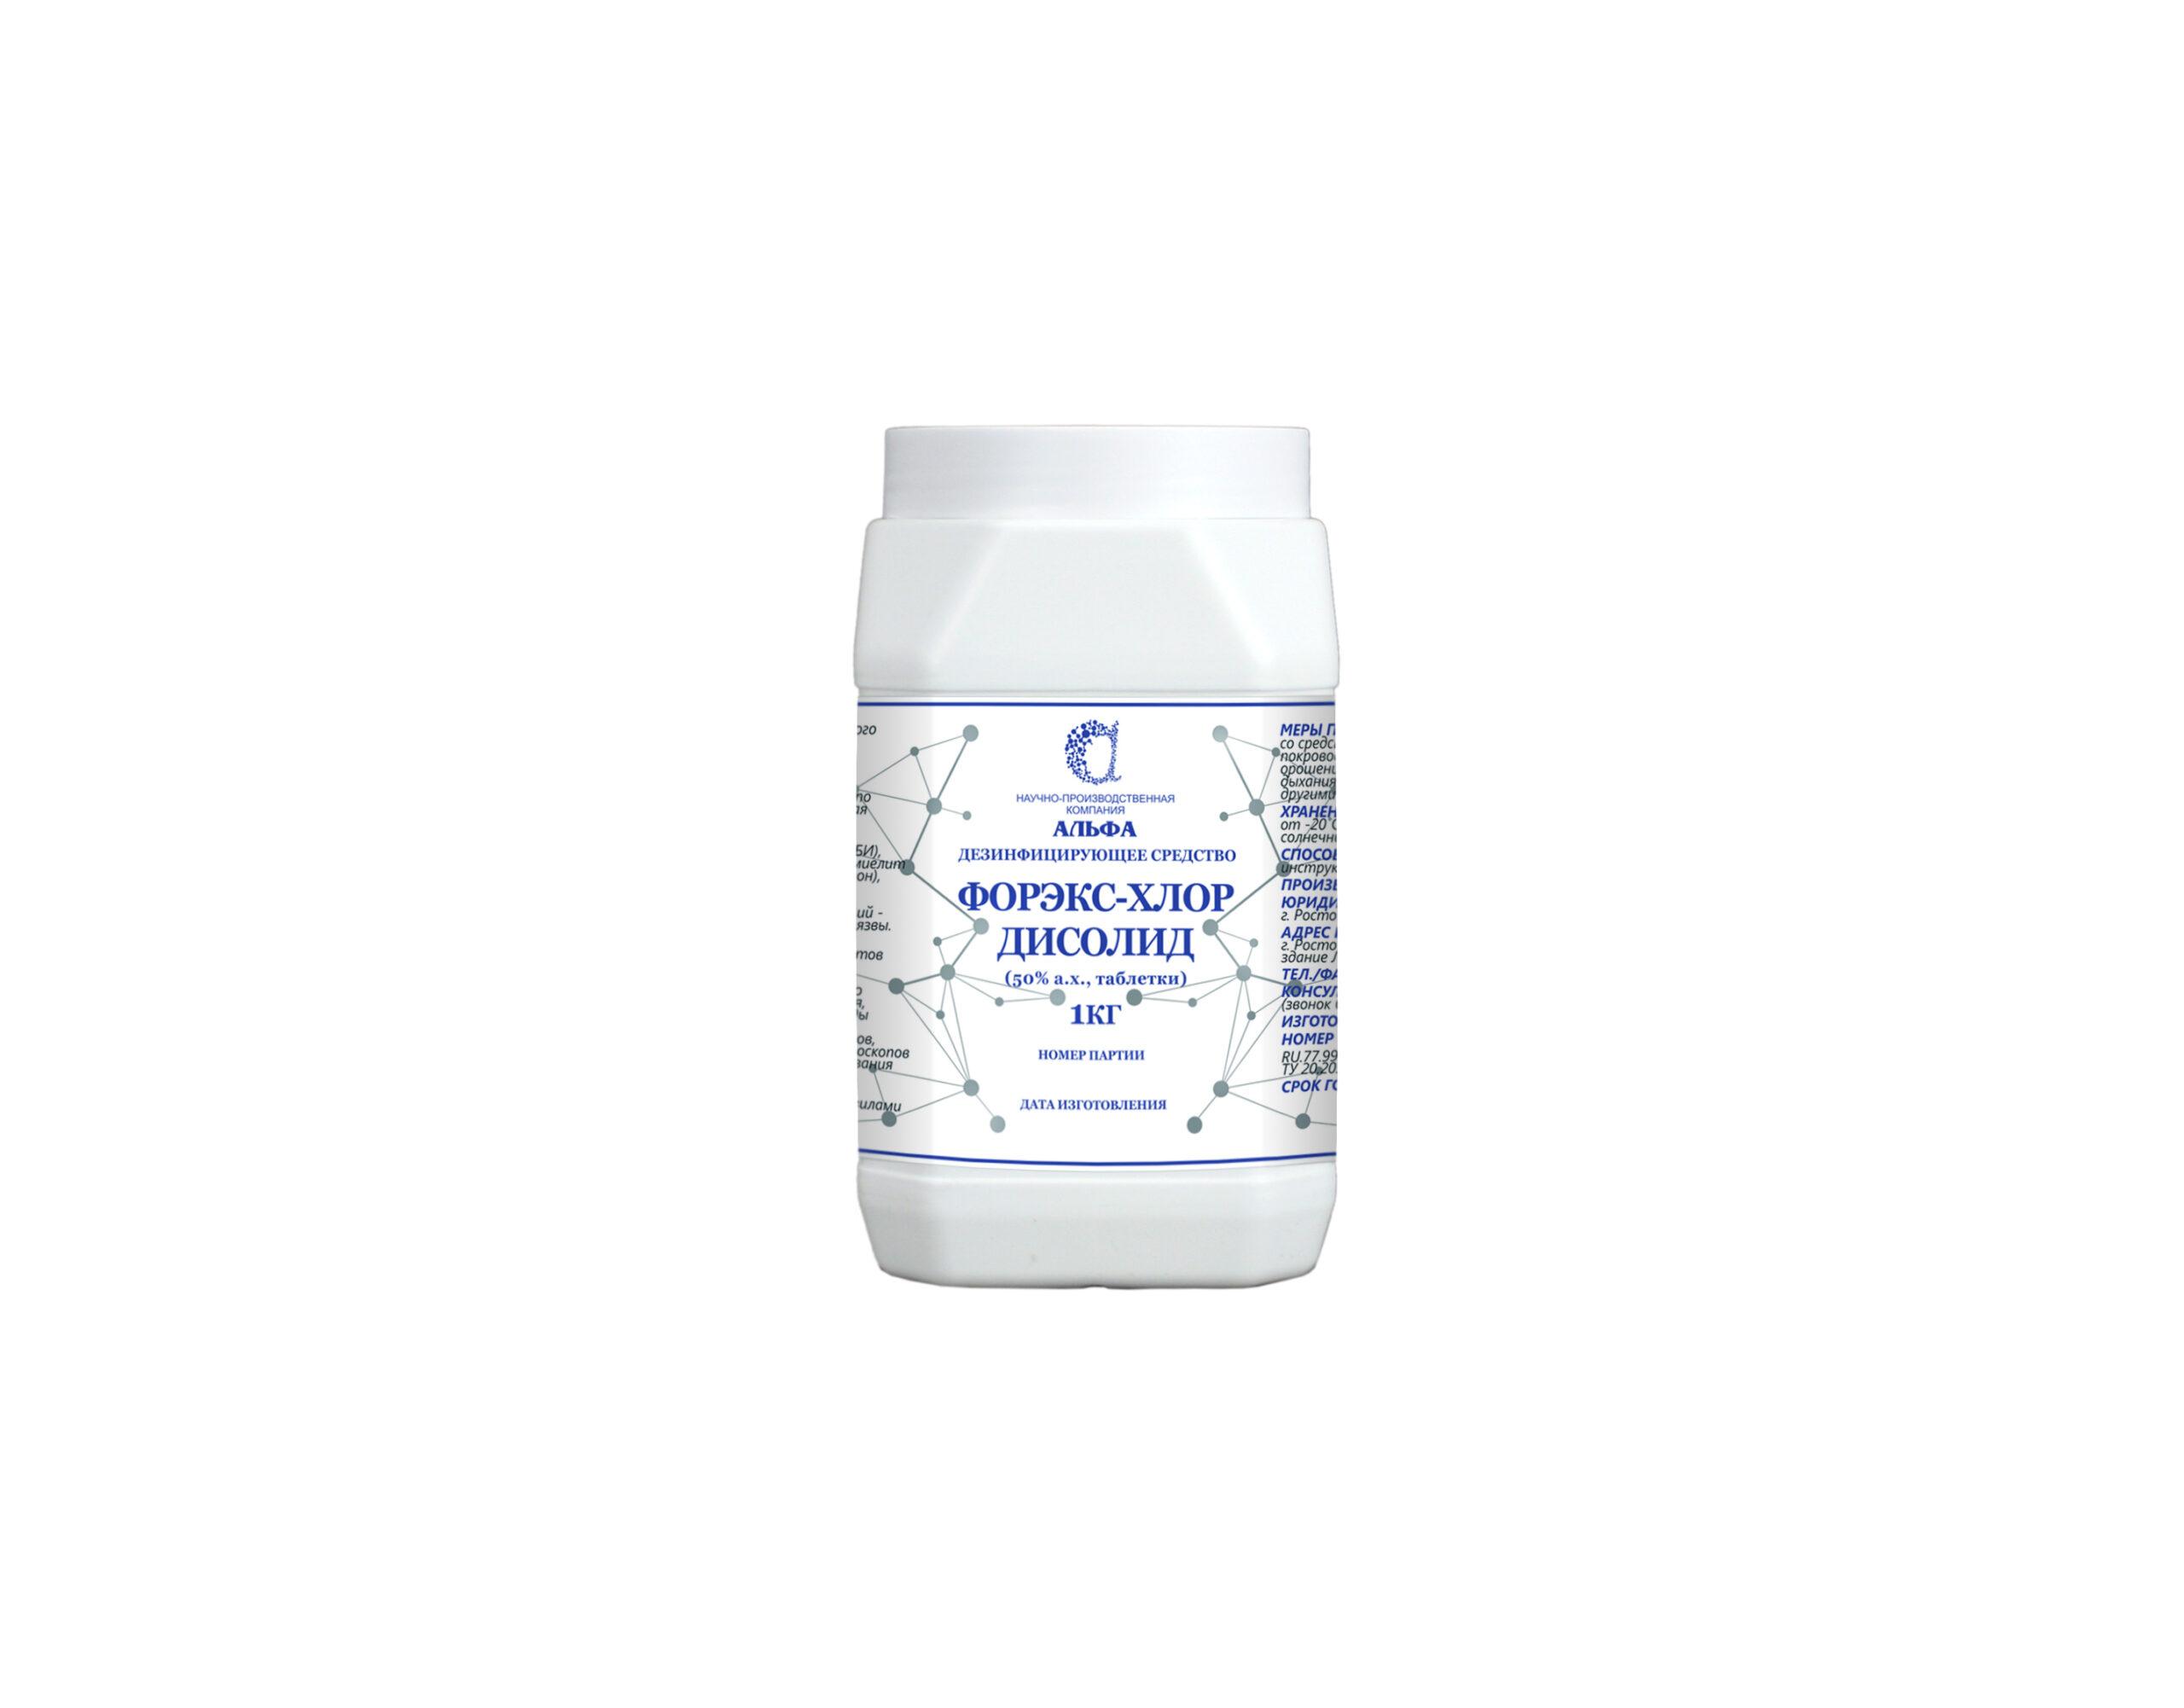 Форекс-хлор дисолид (50% а.х., таблетки)